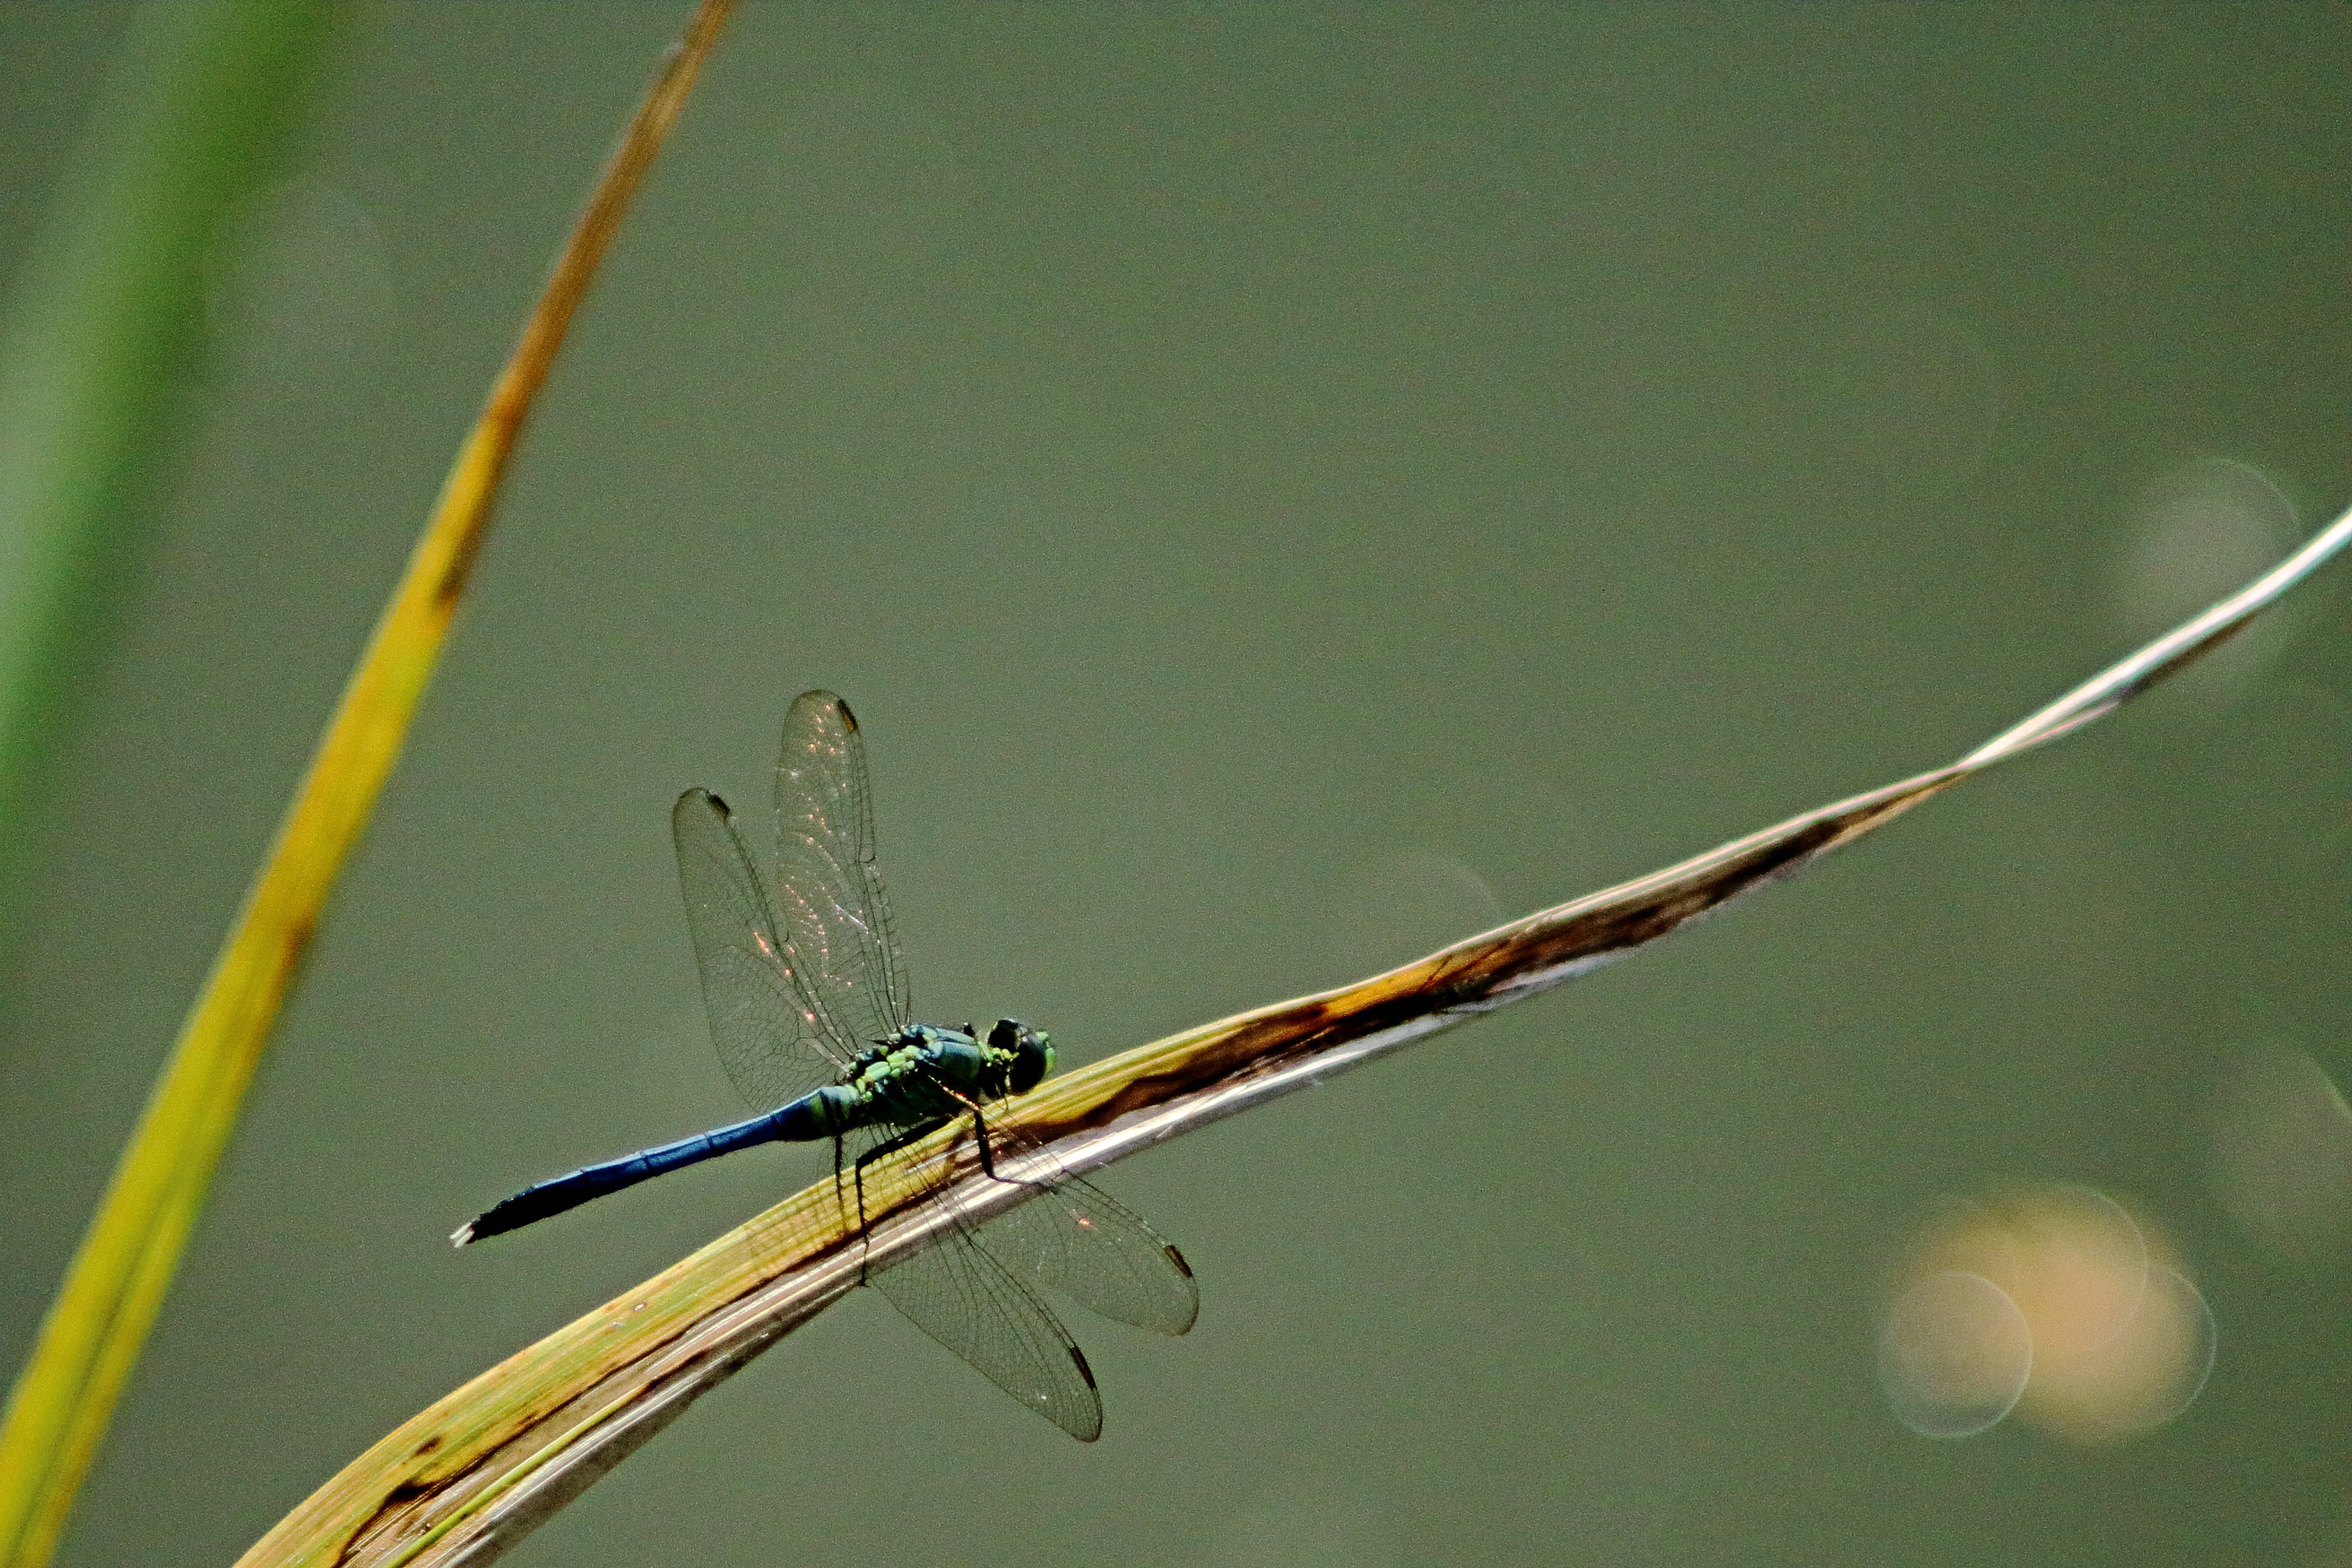 IMG_2887_Dragonfly.jpg